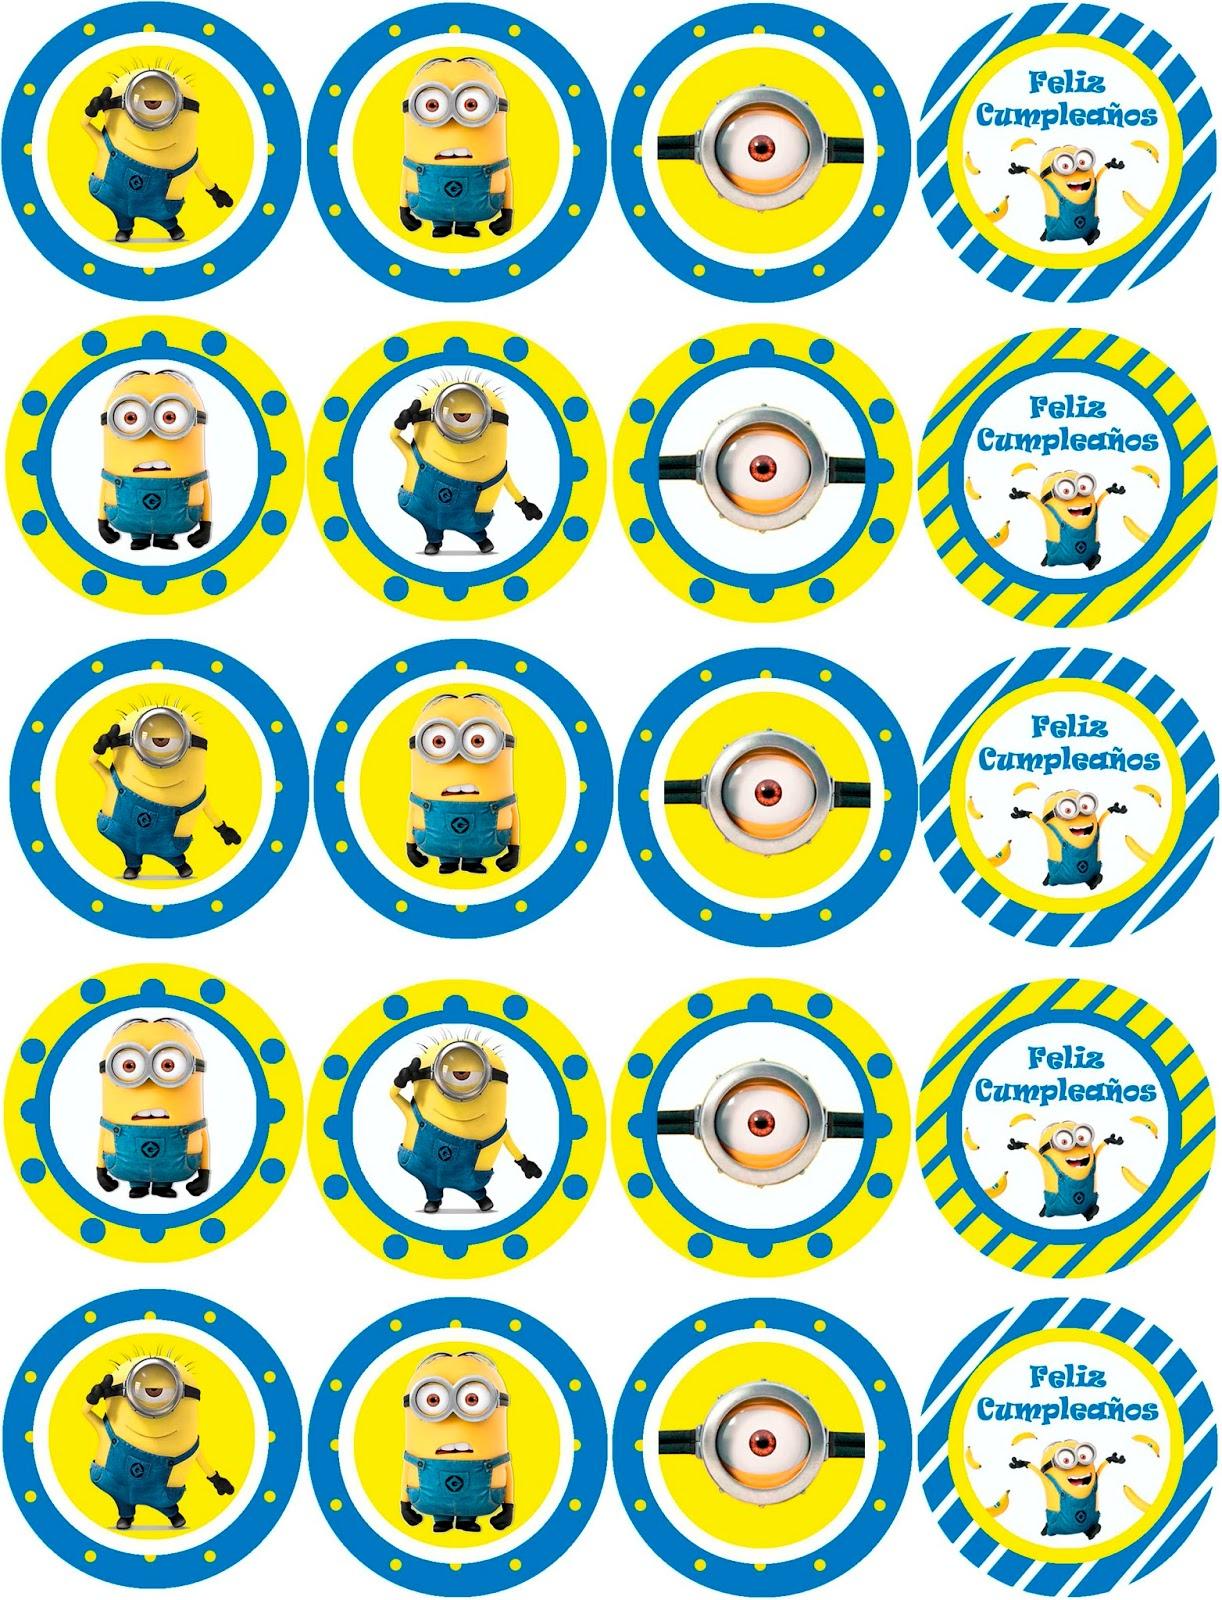 Happy birthday cupcakes ideas - Rtnl